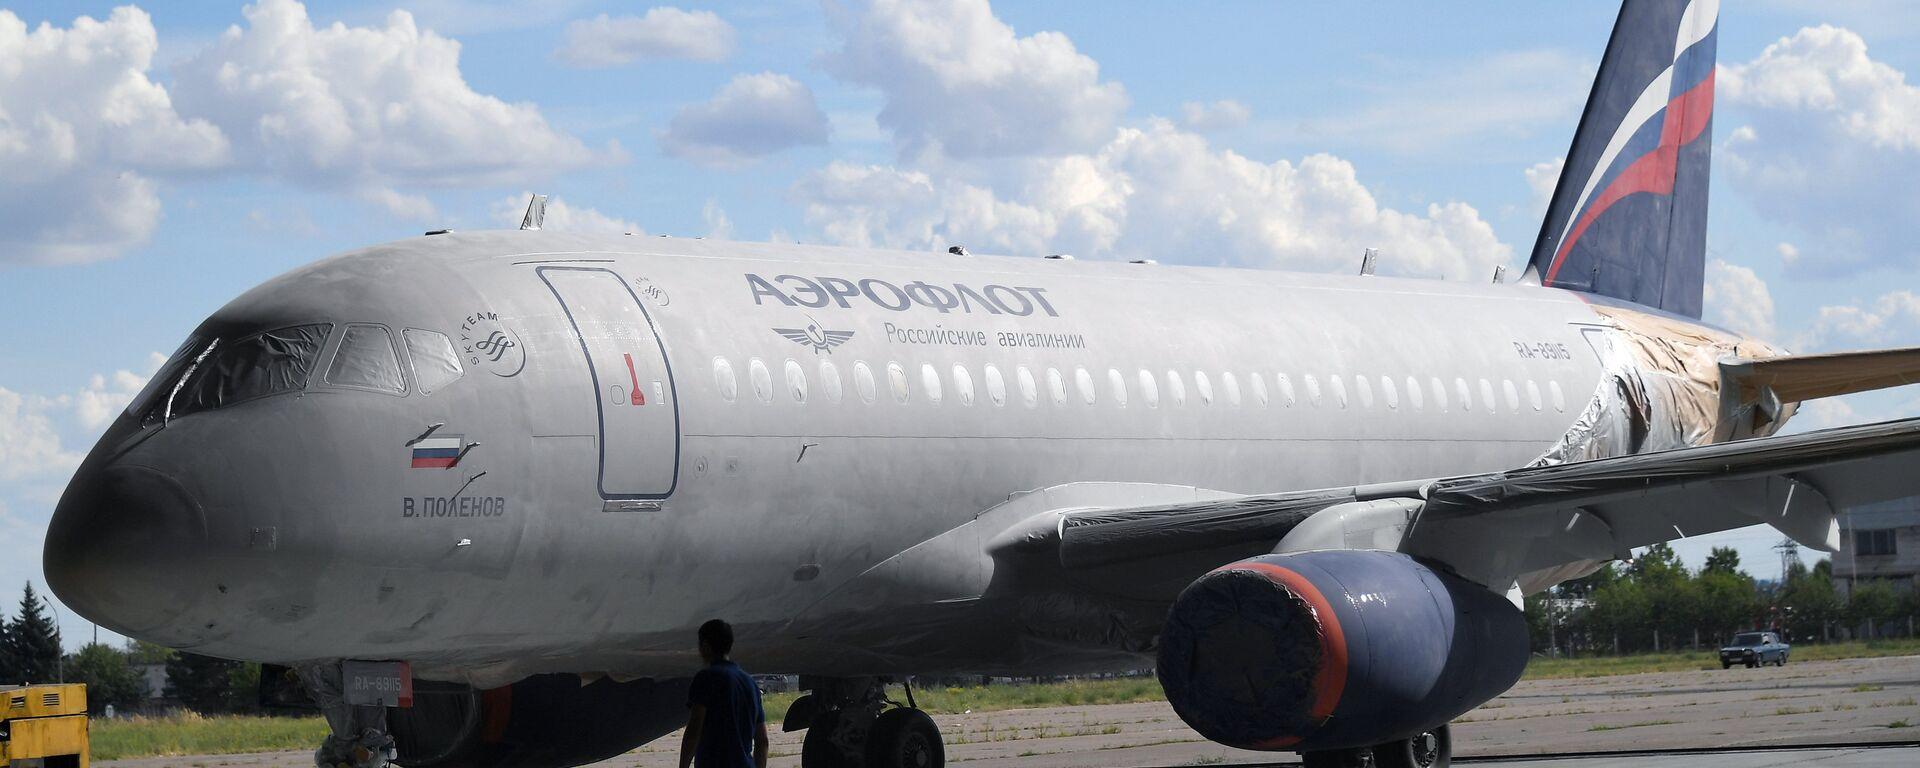 El avión Sukhoi SuperJet 100 en aerolínea Aeroflot - Sputnik Mundo, 1920, 29.01.2021